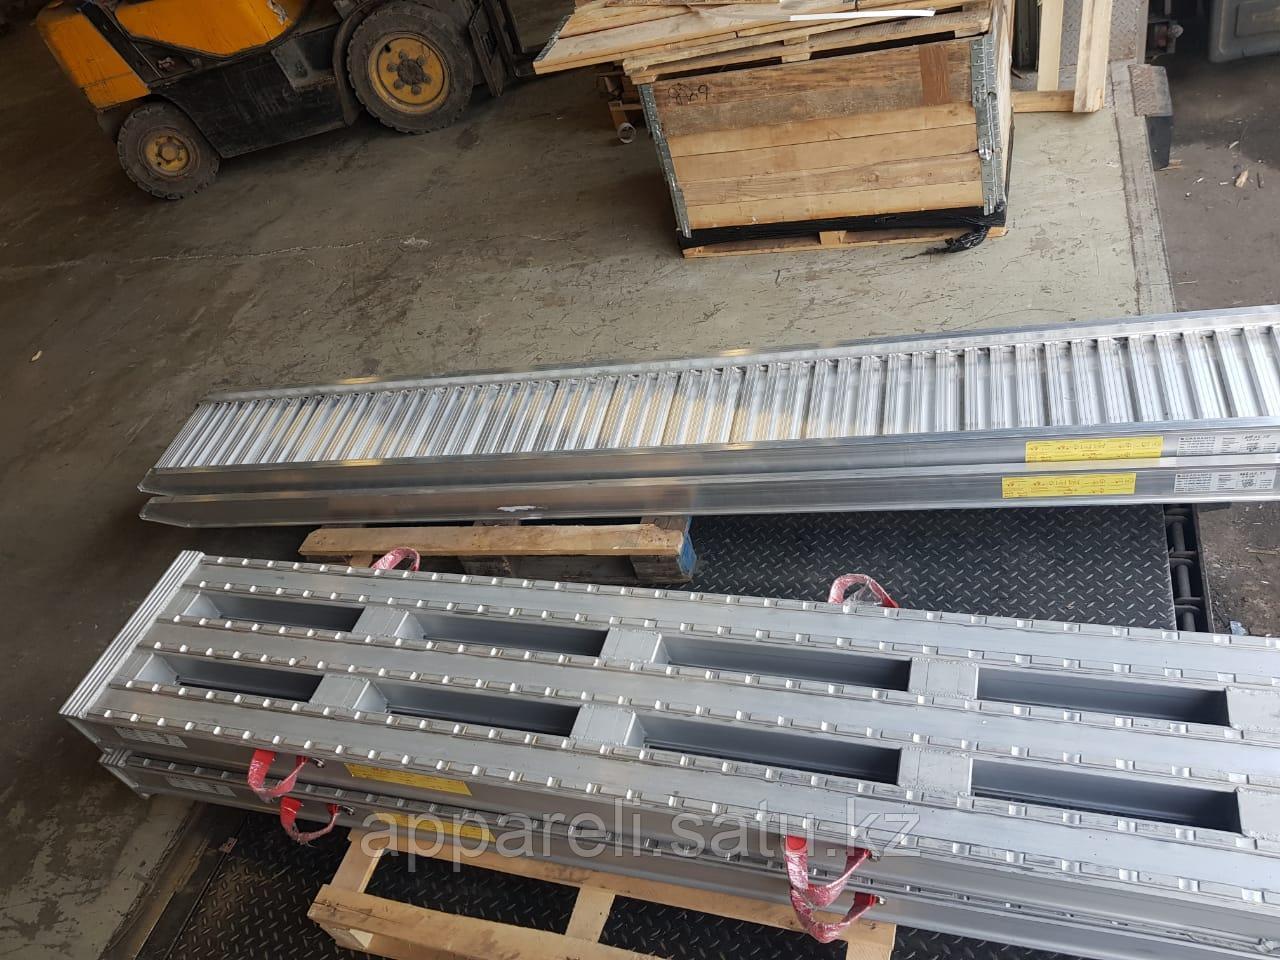 Аппарели, грузоподъёмность 32-35 тонн